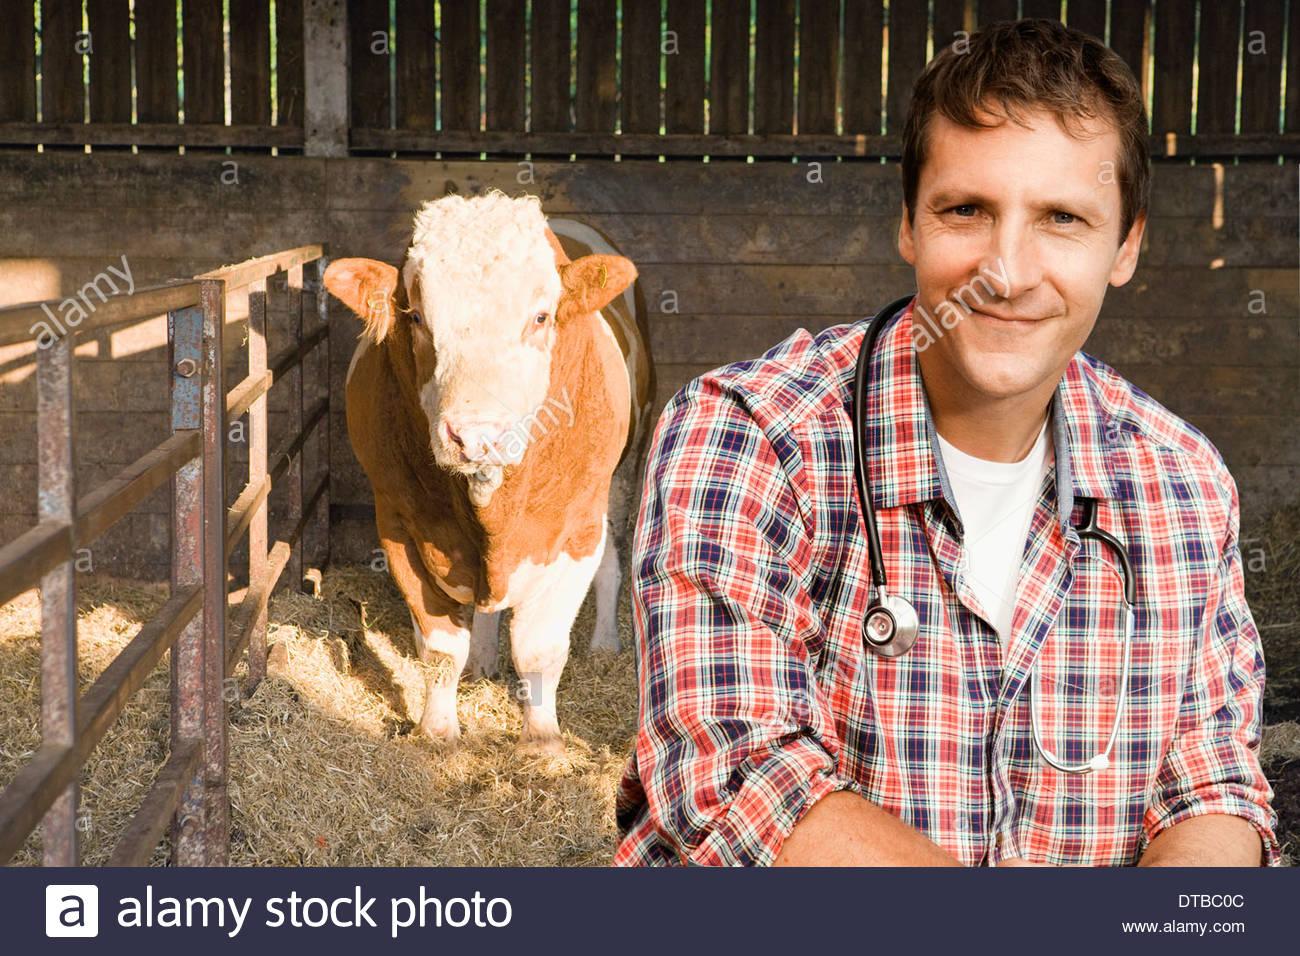 Vet Examining Fresian Bull In Barn - Stock Image